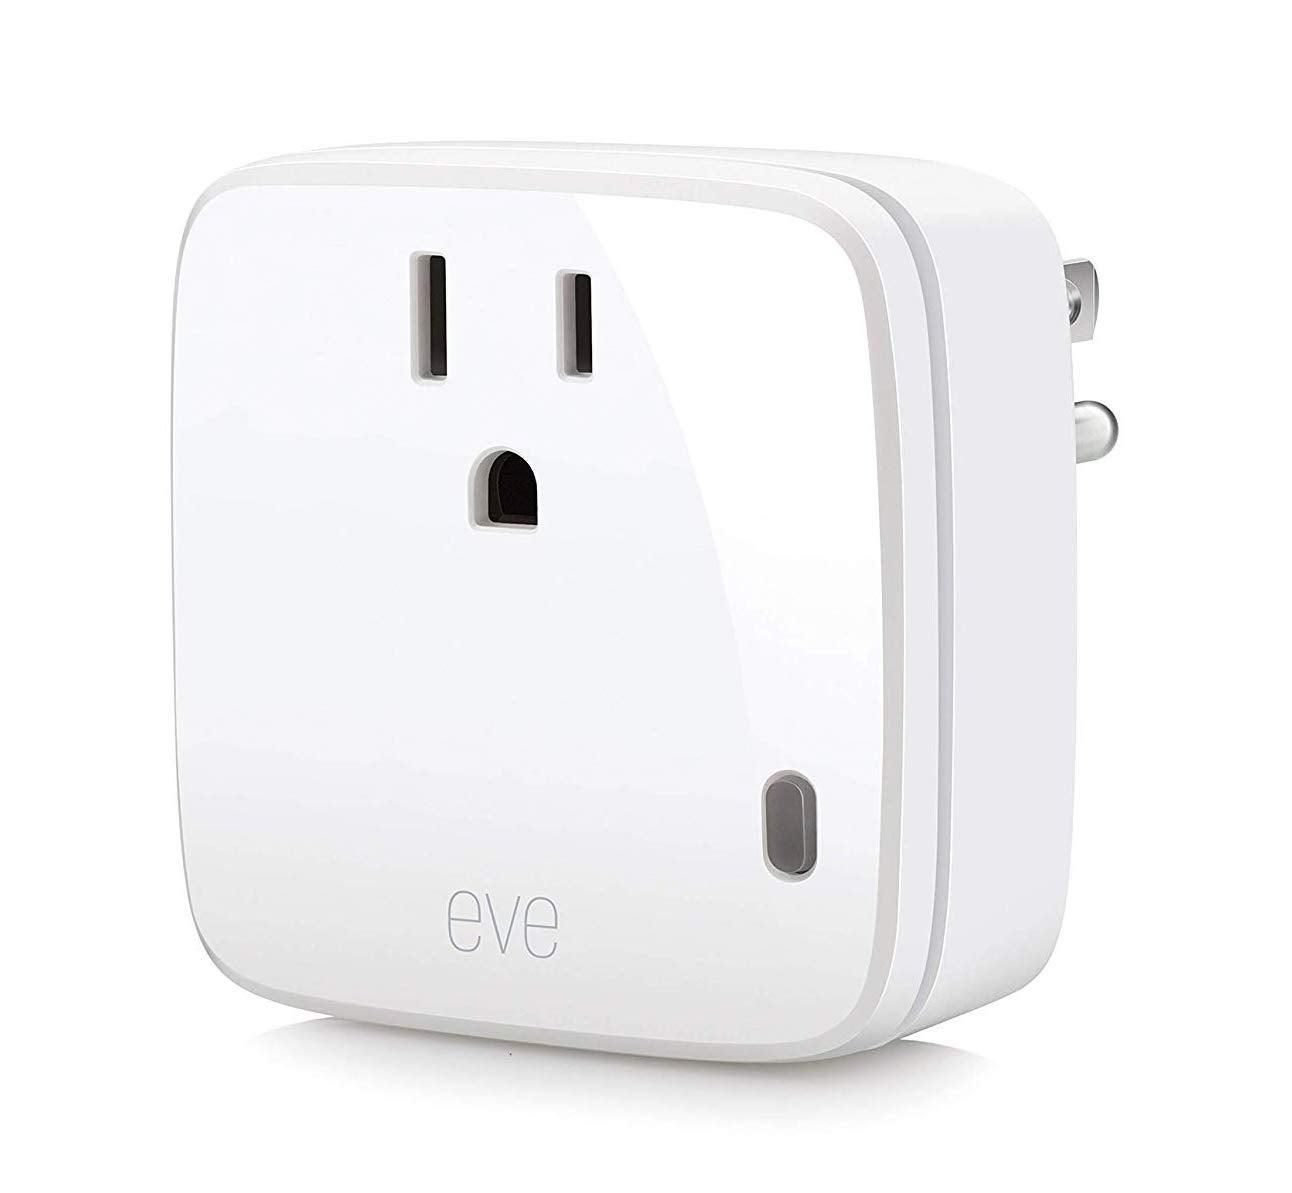 Smart Plug & Power Meter With Built-in